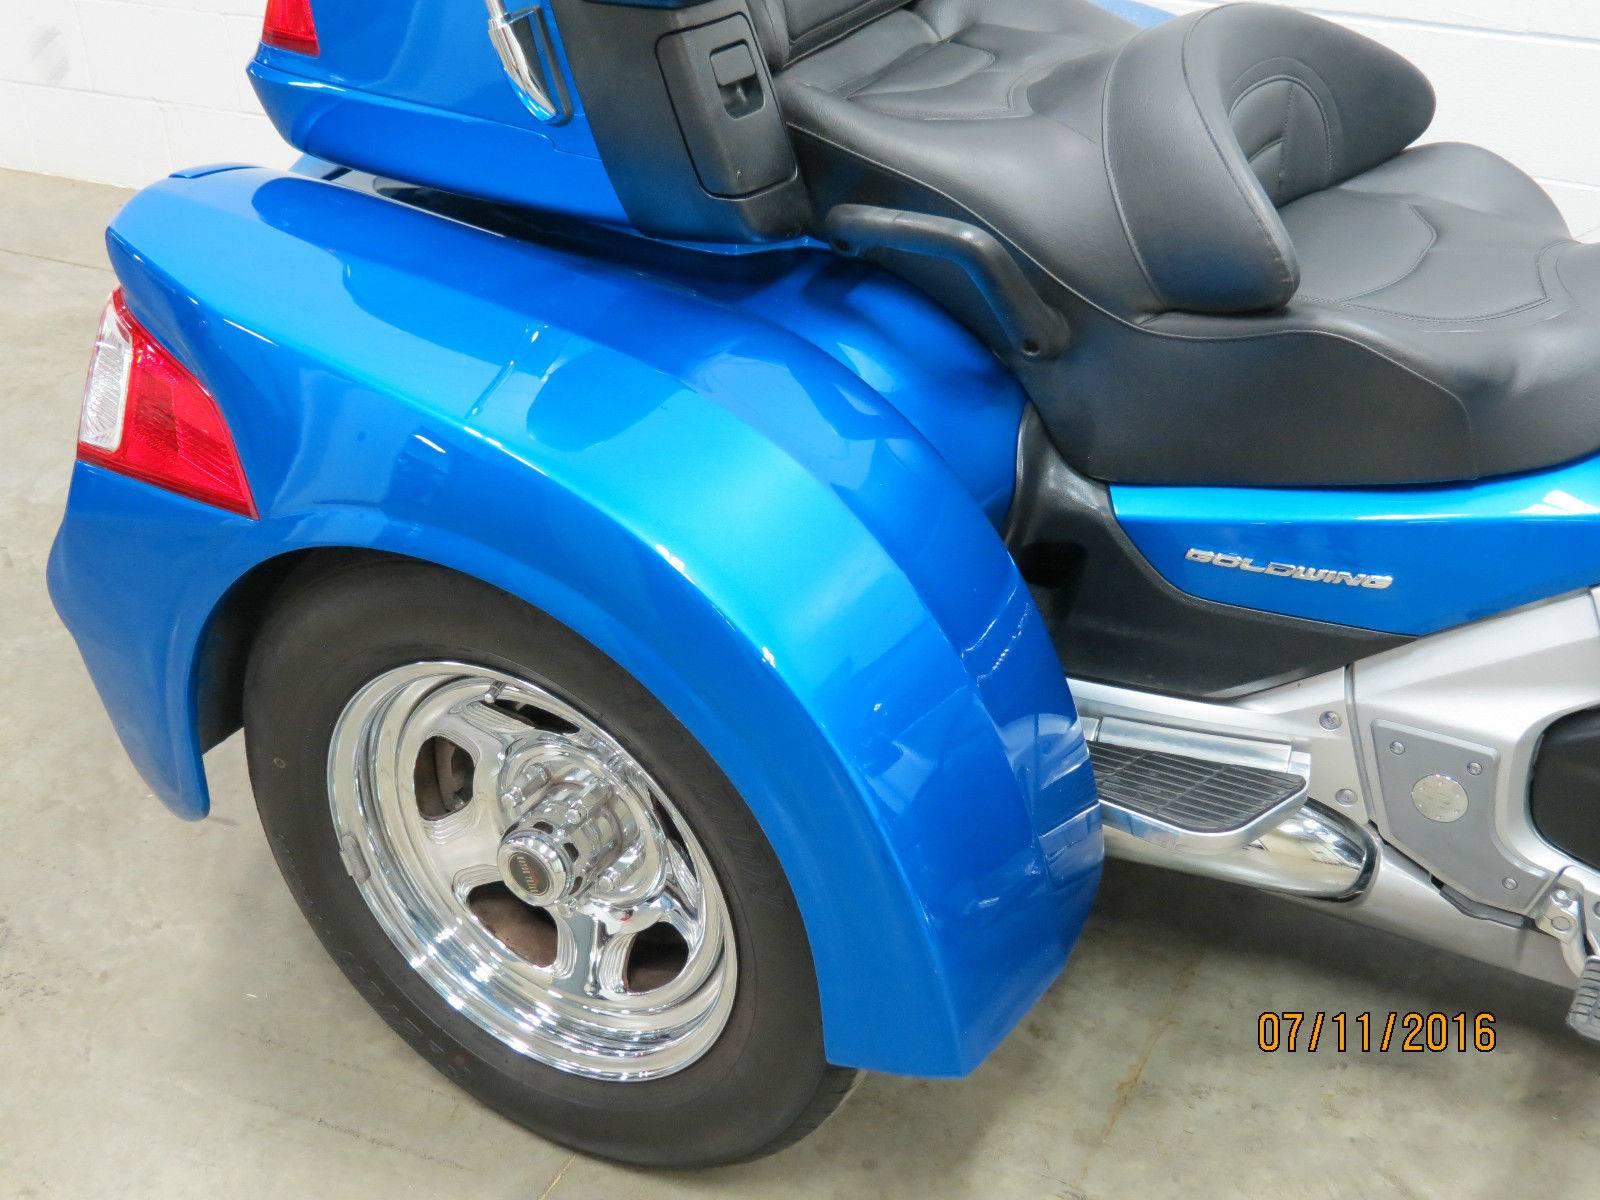 2013 Motor Trike Gl1800 Motor Trike Razor in Lima, Ohio